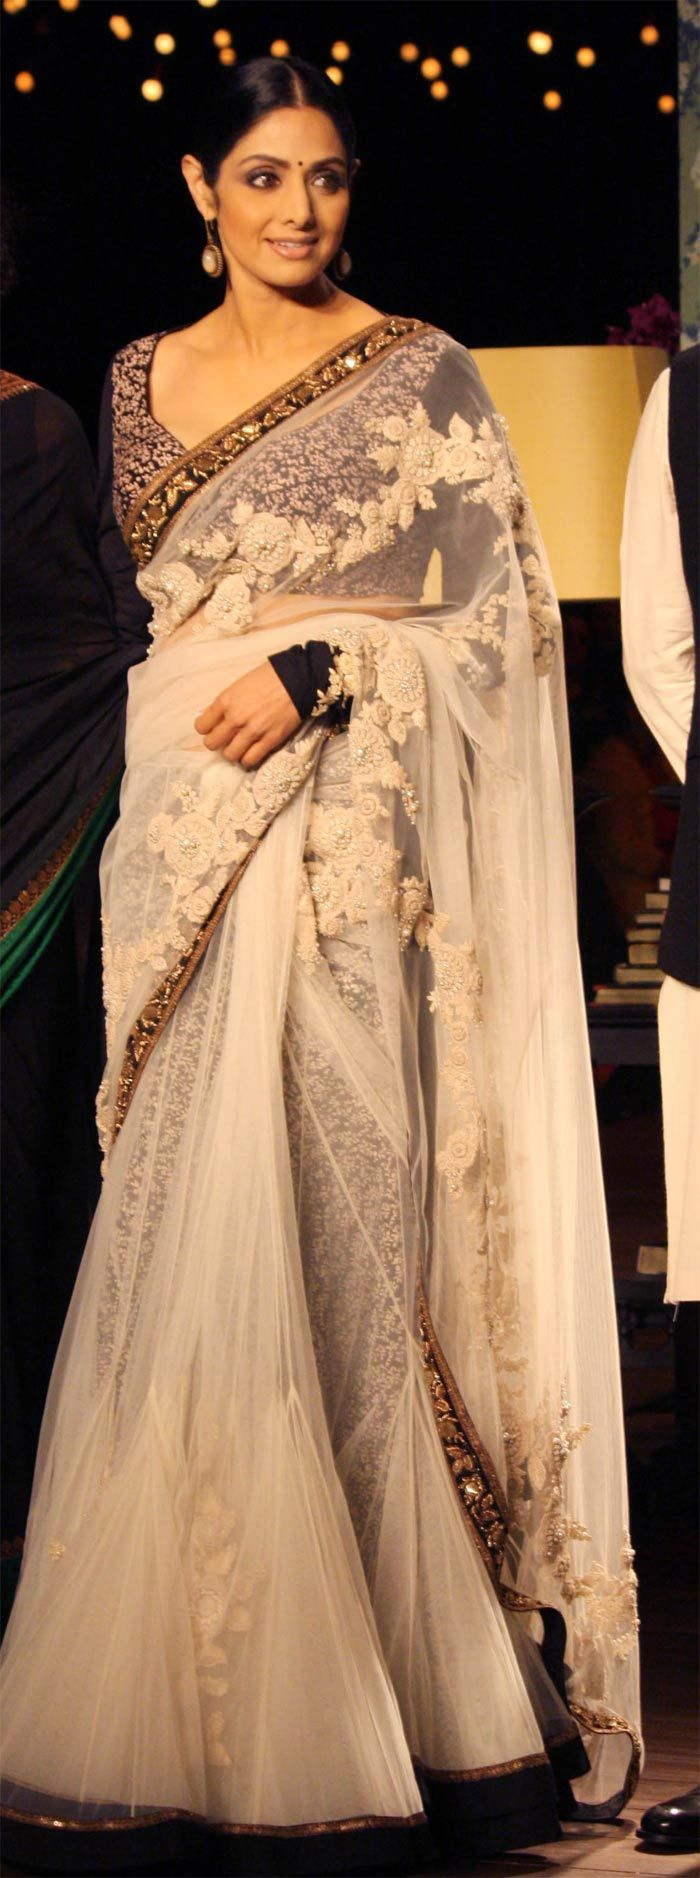 An elegant white chiffon Sabyasatchi sari.